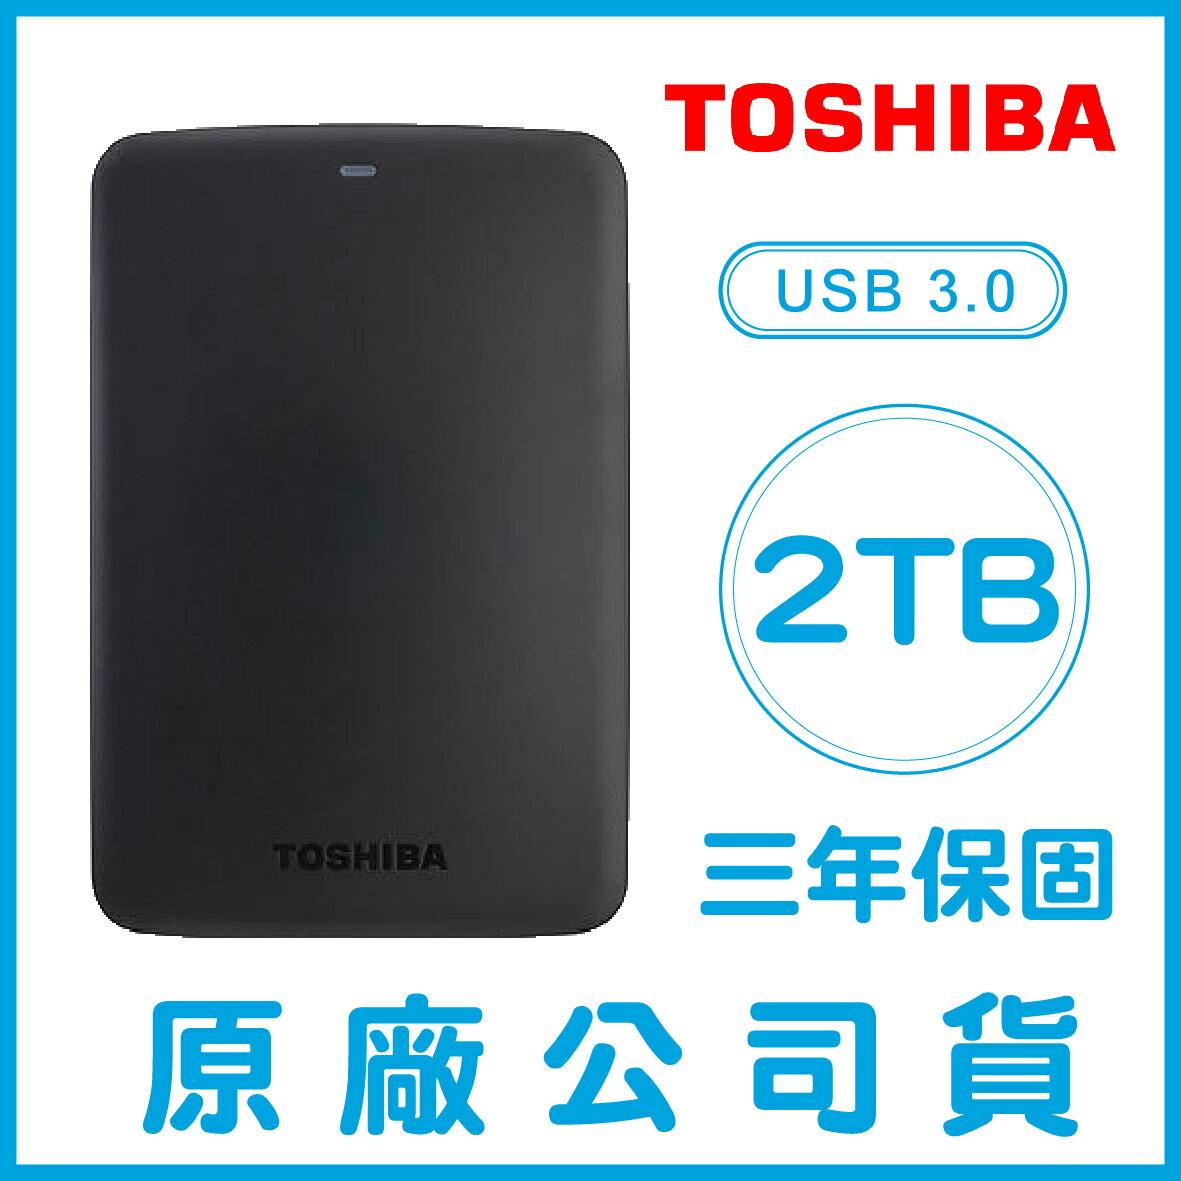 TOSHIBA 2TB USB3.0 2.5吋 外接硬碟 行動硬碟 東芝 Canvio Basics 2T 隨身硬碟